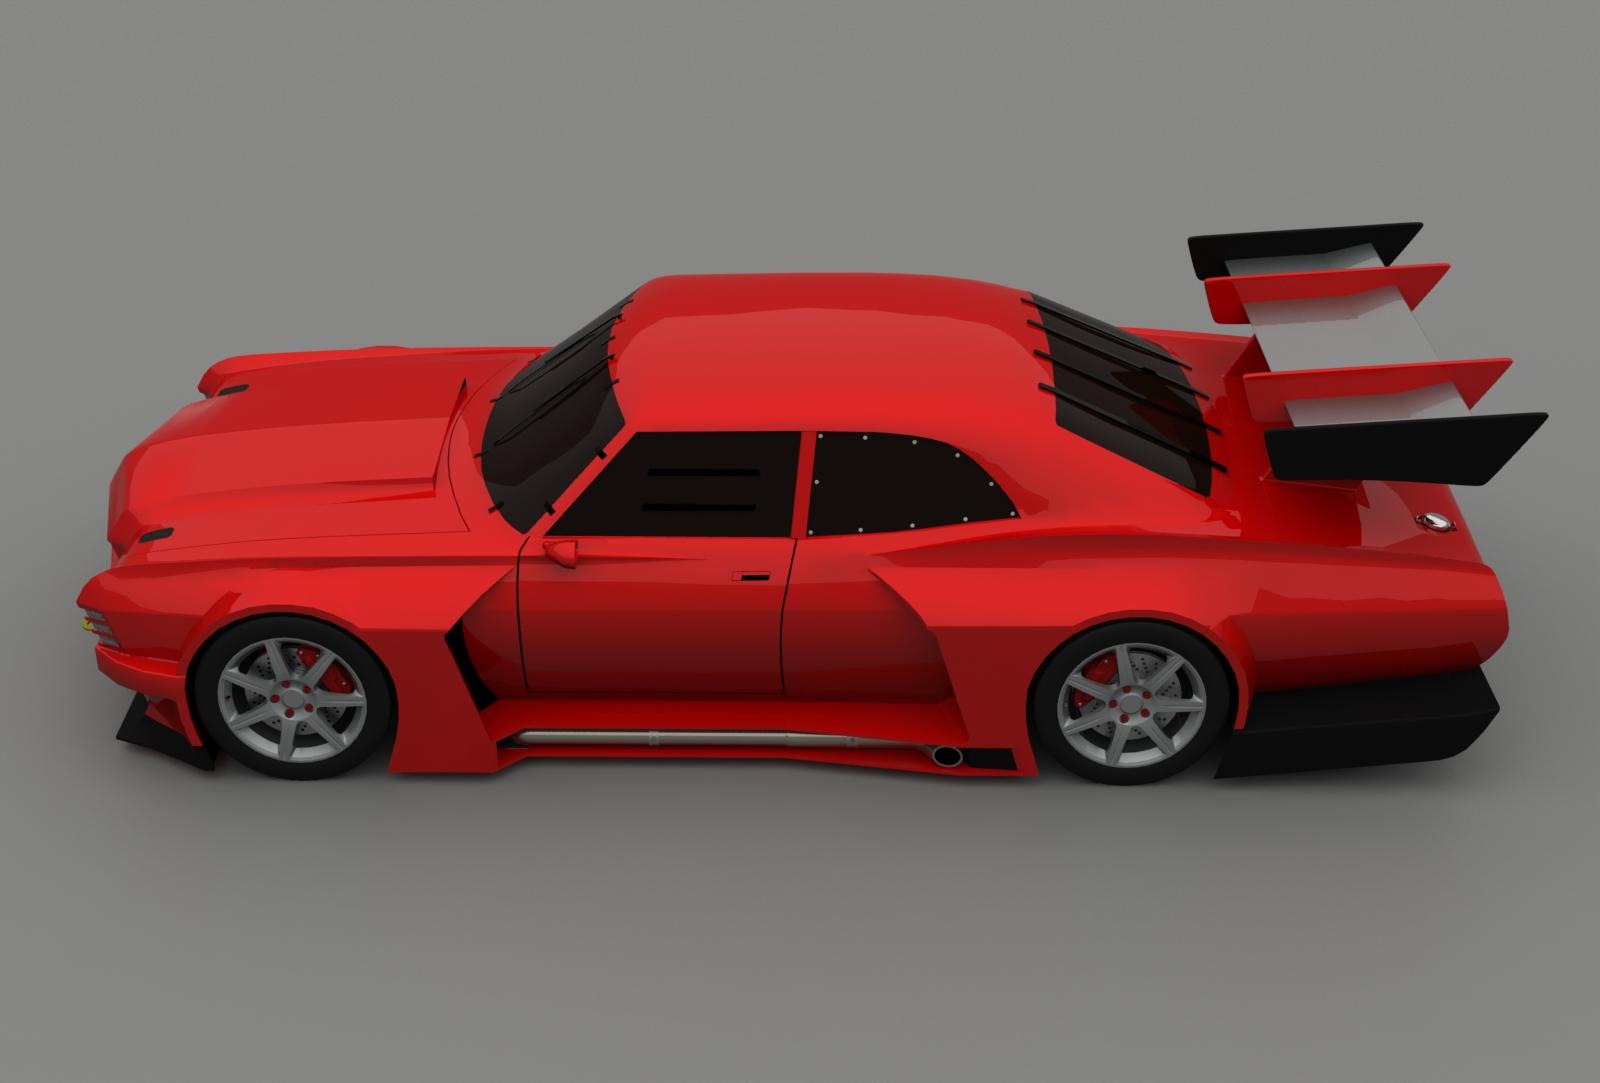 2013-03_The Crew_F.Beudin_Chevrolet Impala-1967-Racing2 Design_03